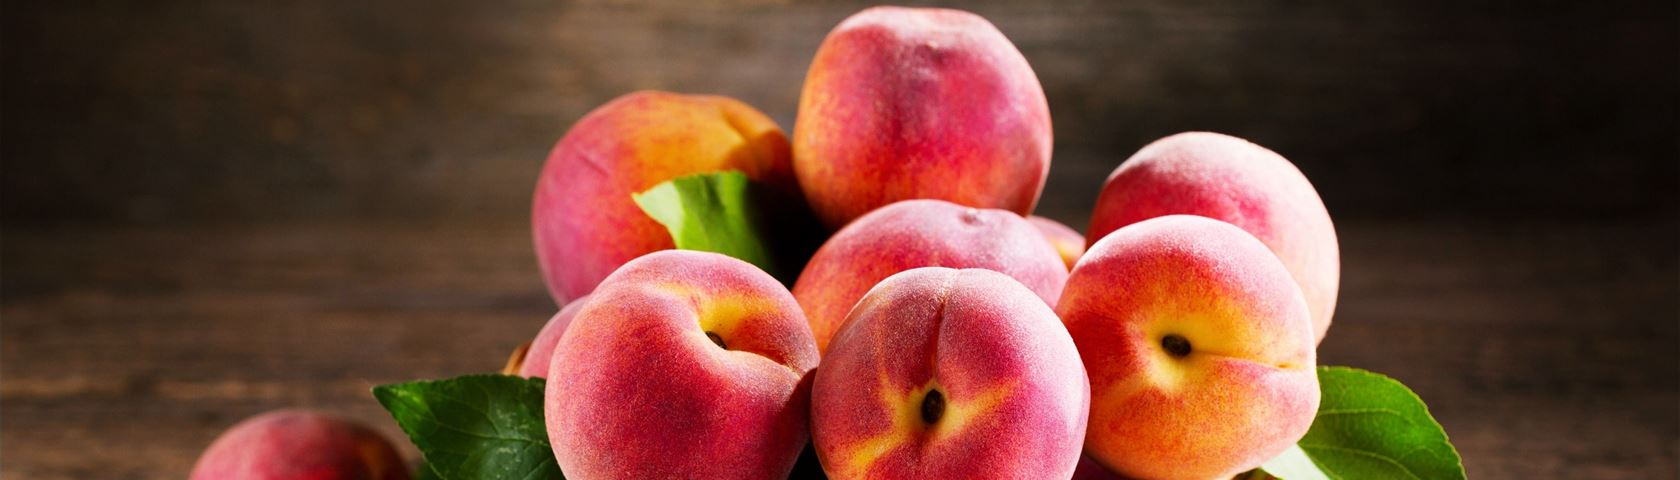 Plump Peaches